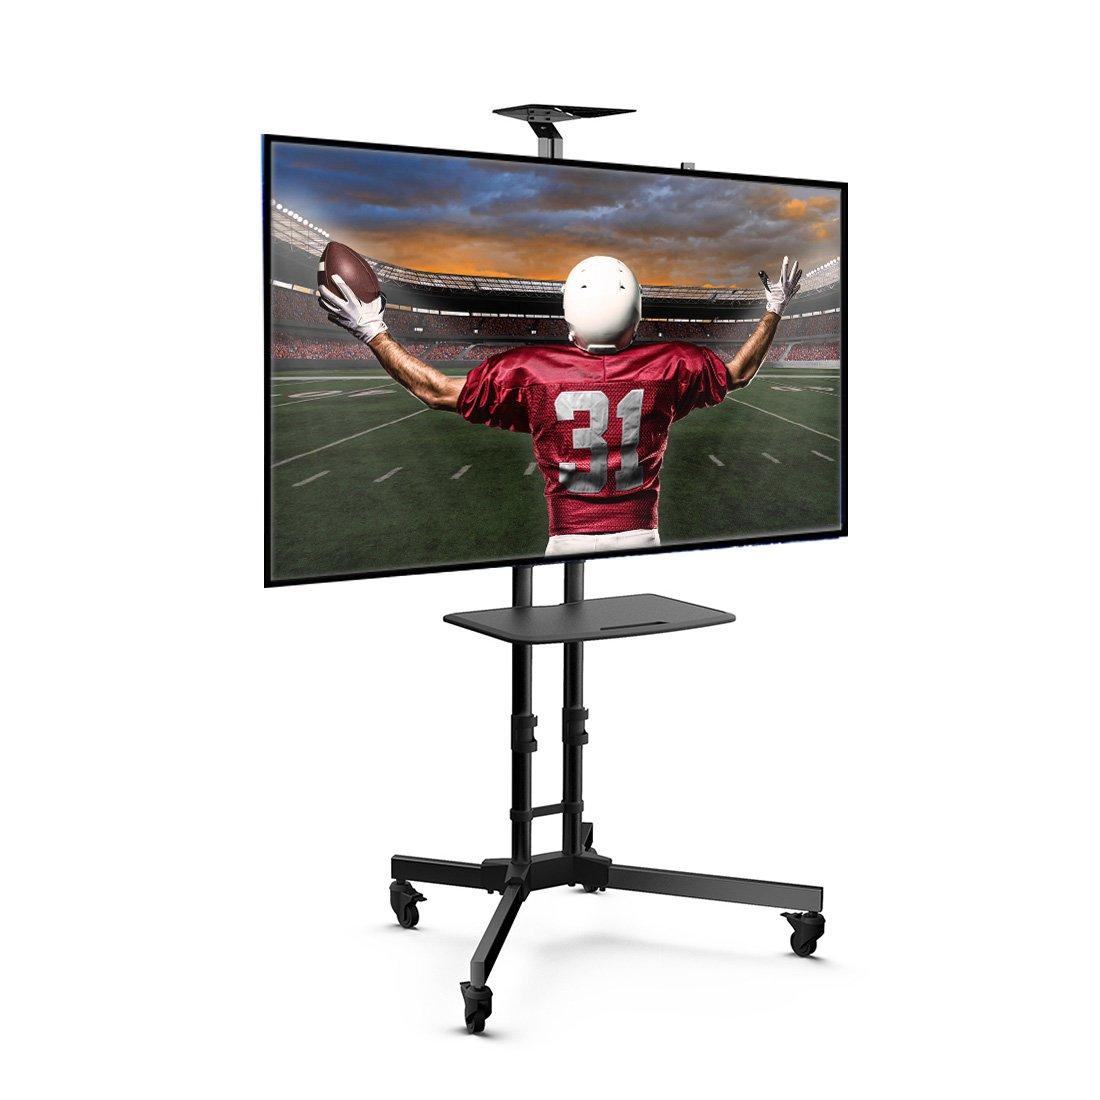 loctek p3b universal mobile tv stand tv cart with height. Black Bedroom Furniture Sets. Home Design Ideas